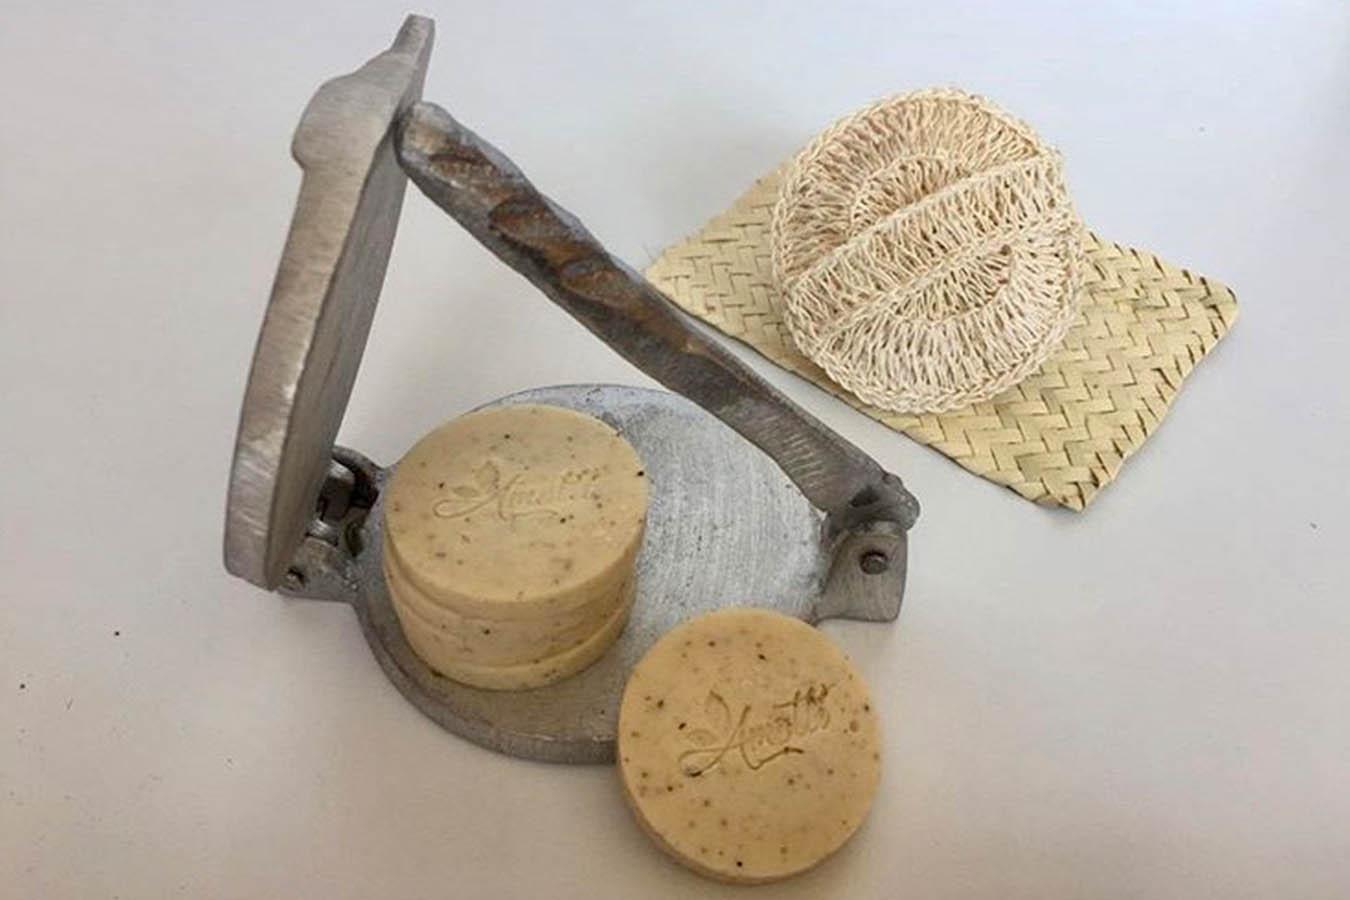 jabon de maiz izamaiz jabones artesanales cosmetica natural